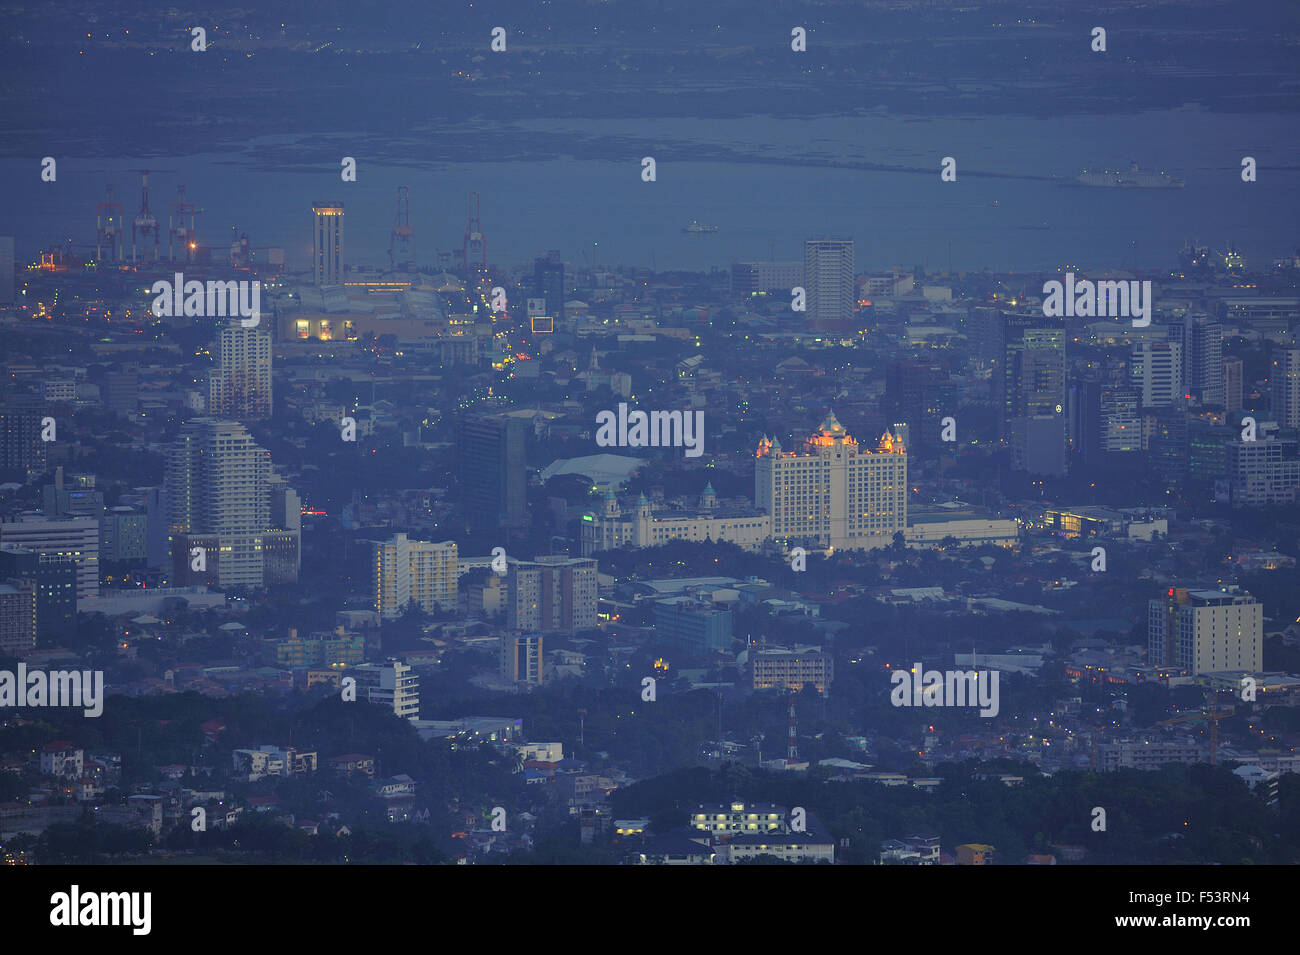 Cebu City viewed from Tops Busay. Stock Photo